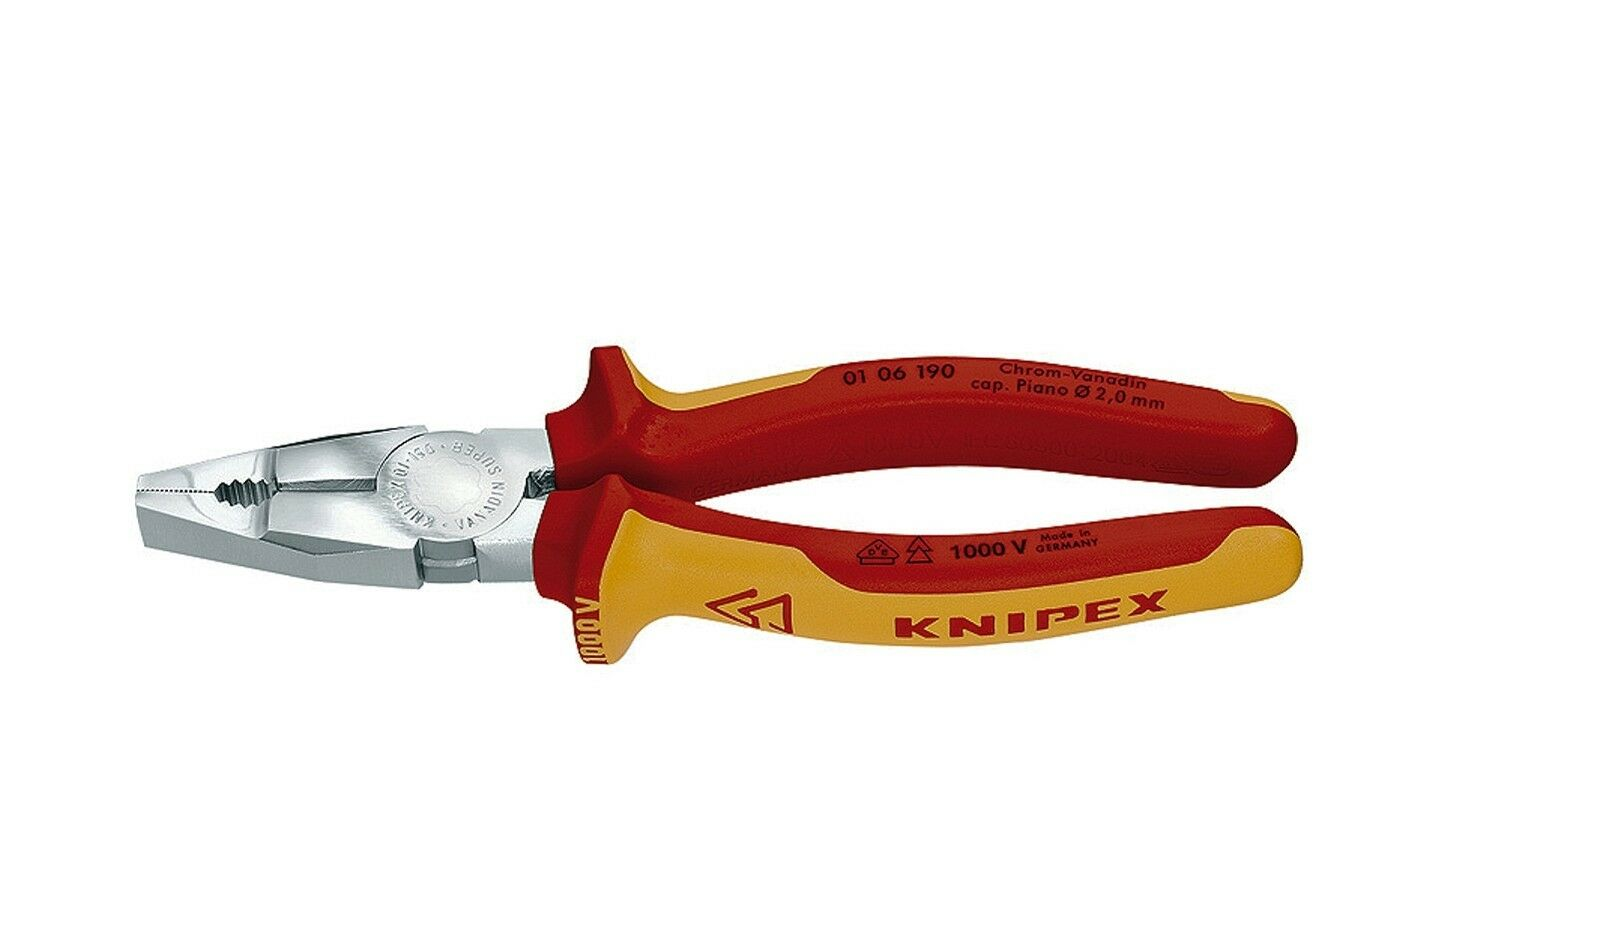 Knipex Combi Pliers Chrom-Vanadin Model 01 06, 2 Lengths